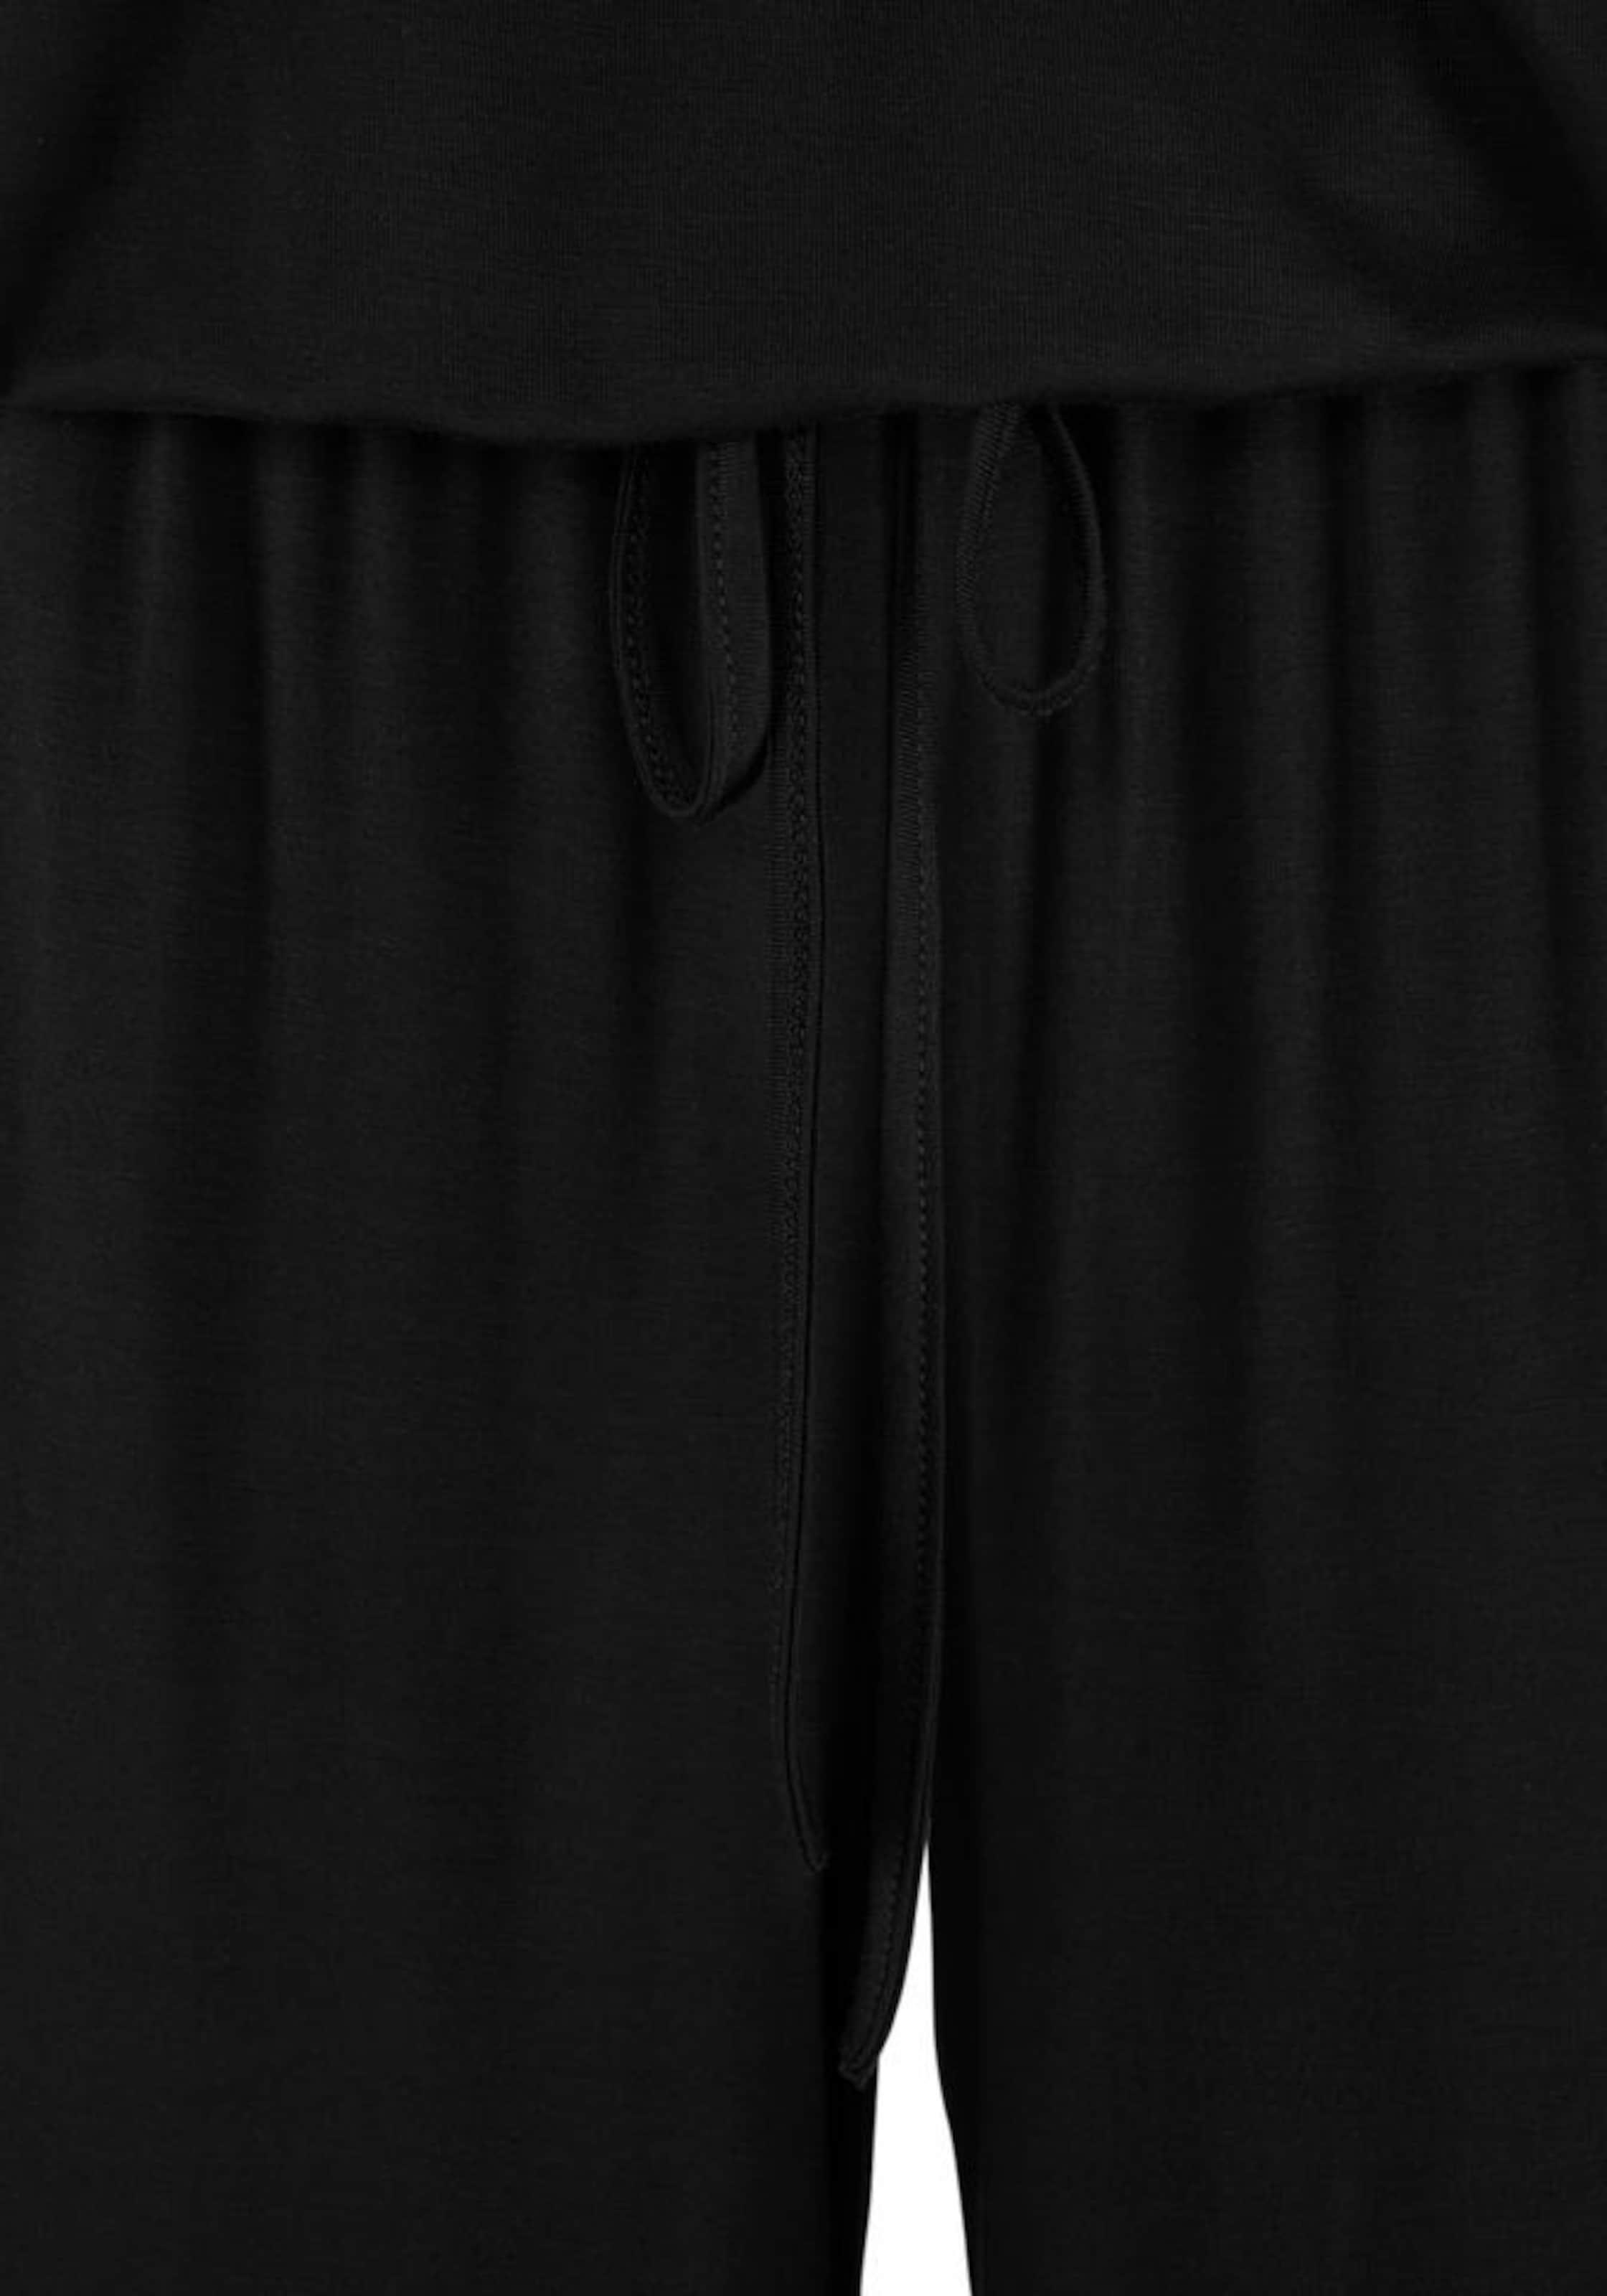 Combinaison En Lascana Combinaison Noir Lascana Combinaison Noir En Lascana 4jLqAR35